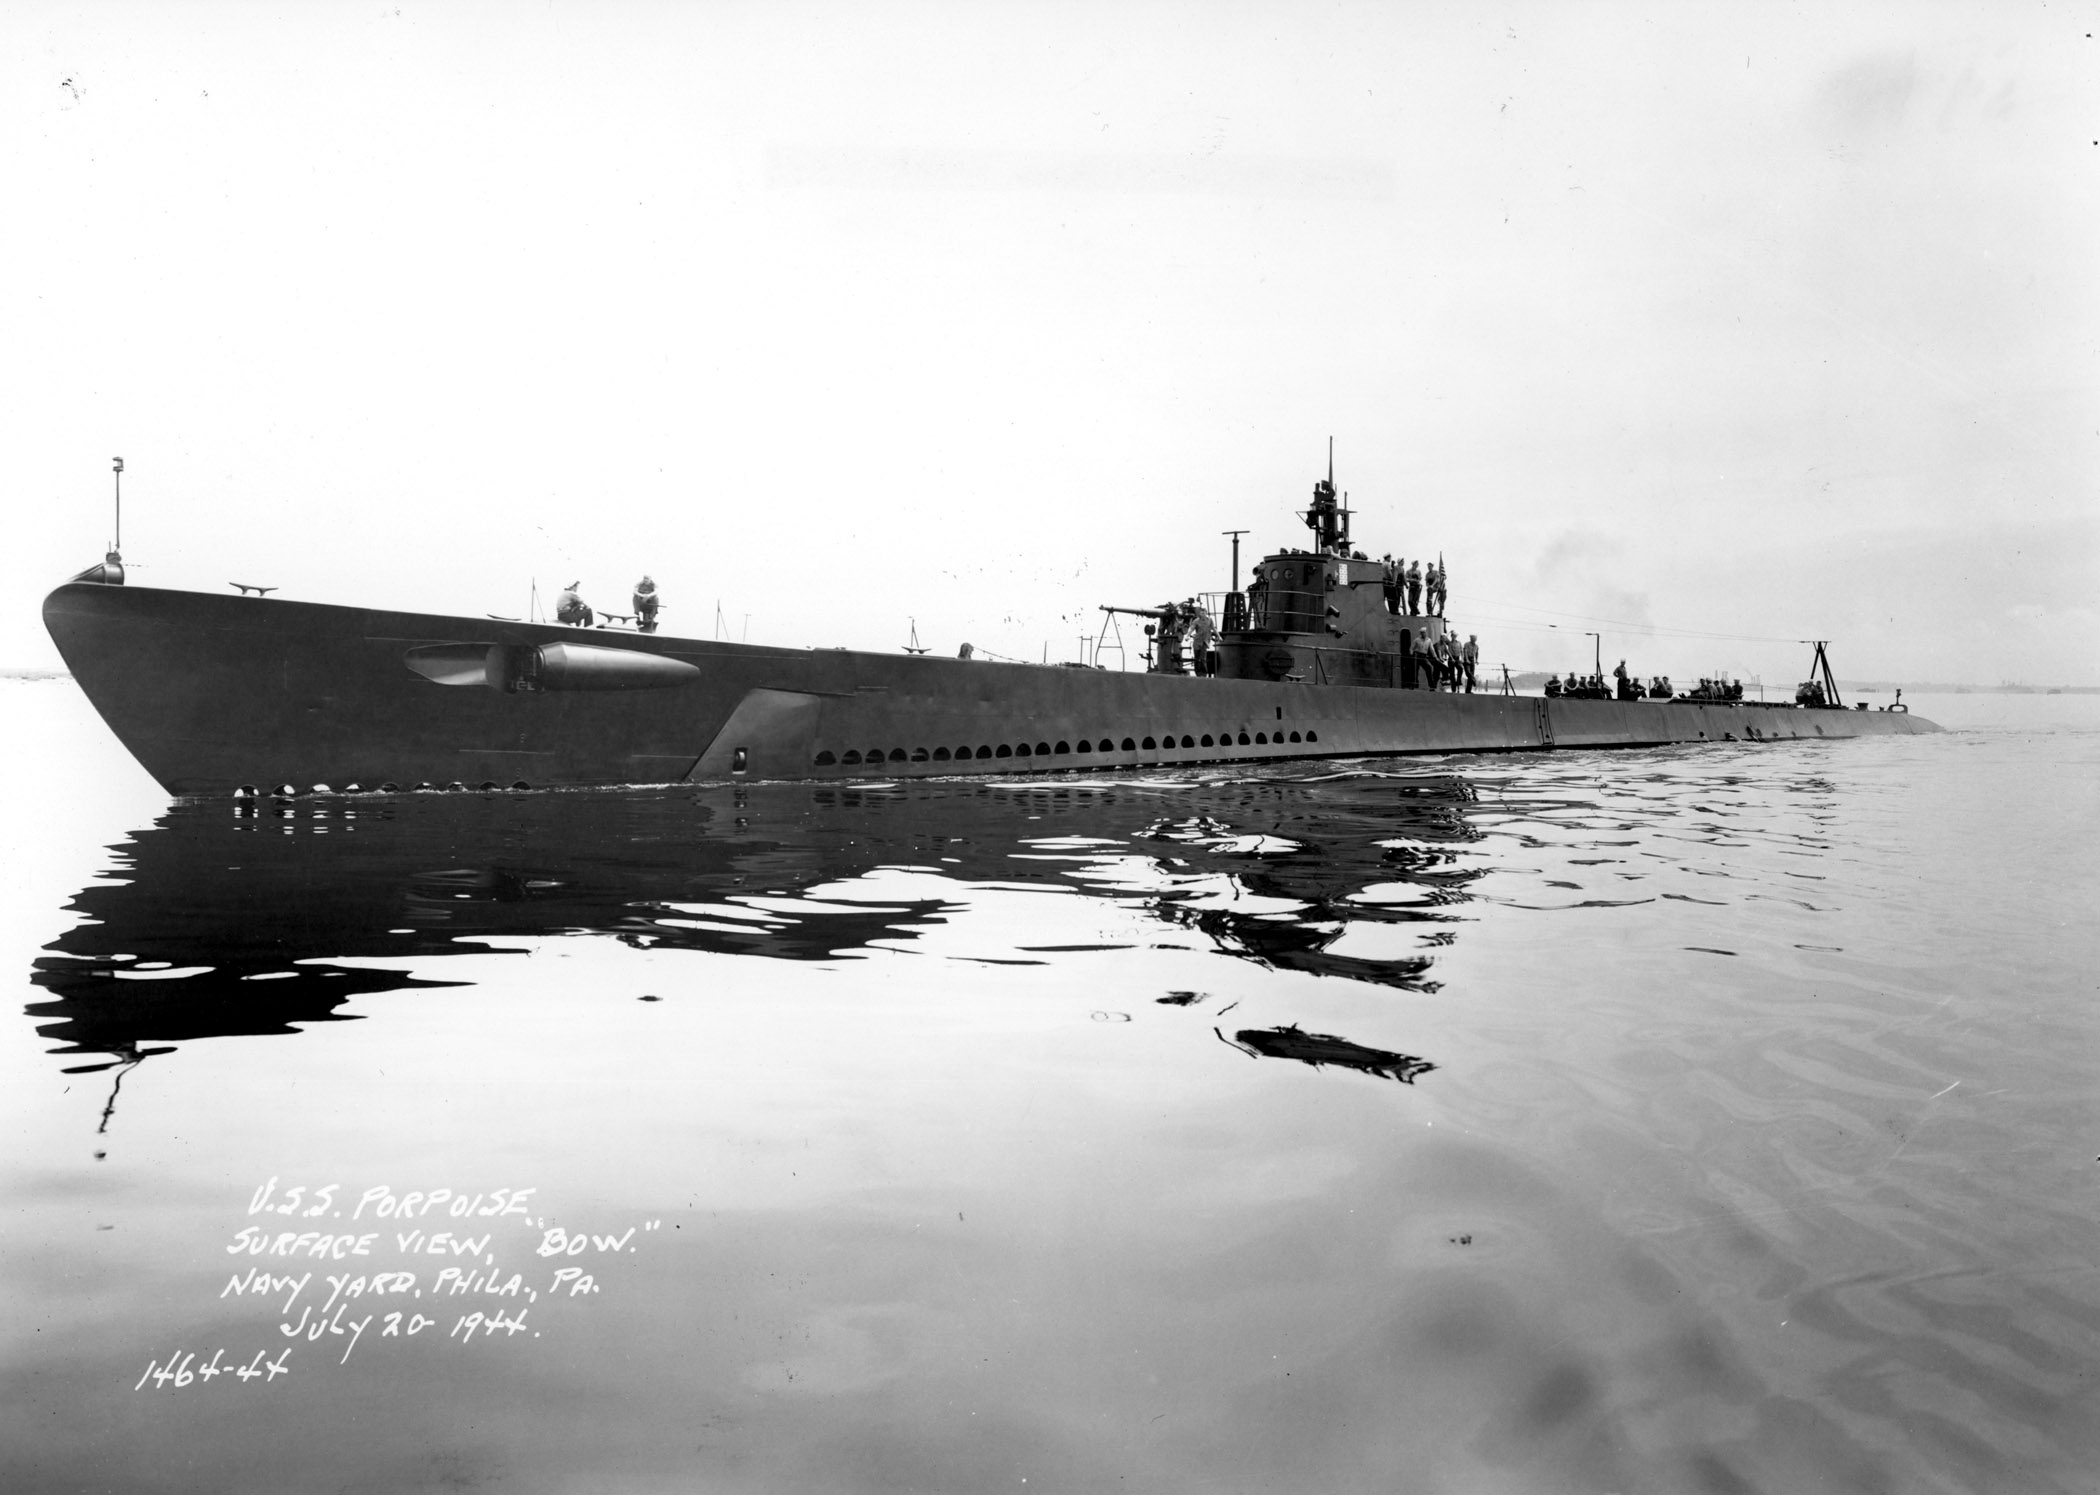 USS Porpoise  SS-172